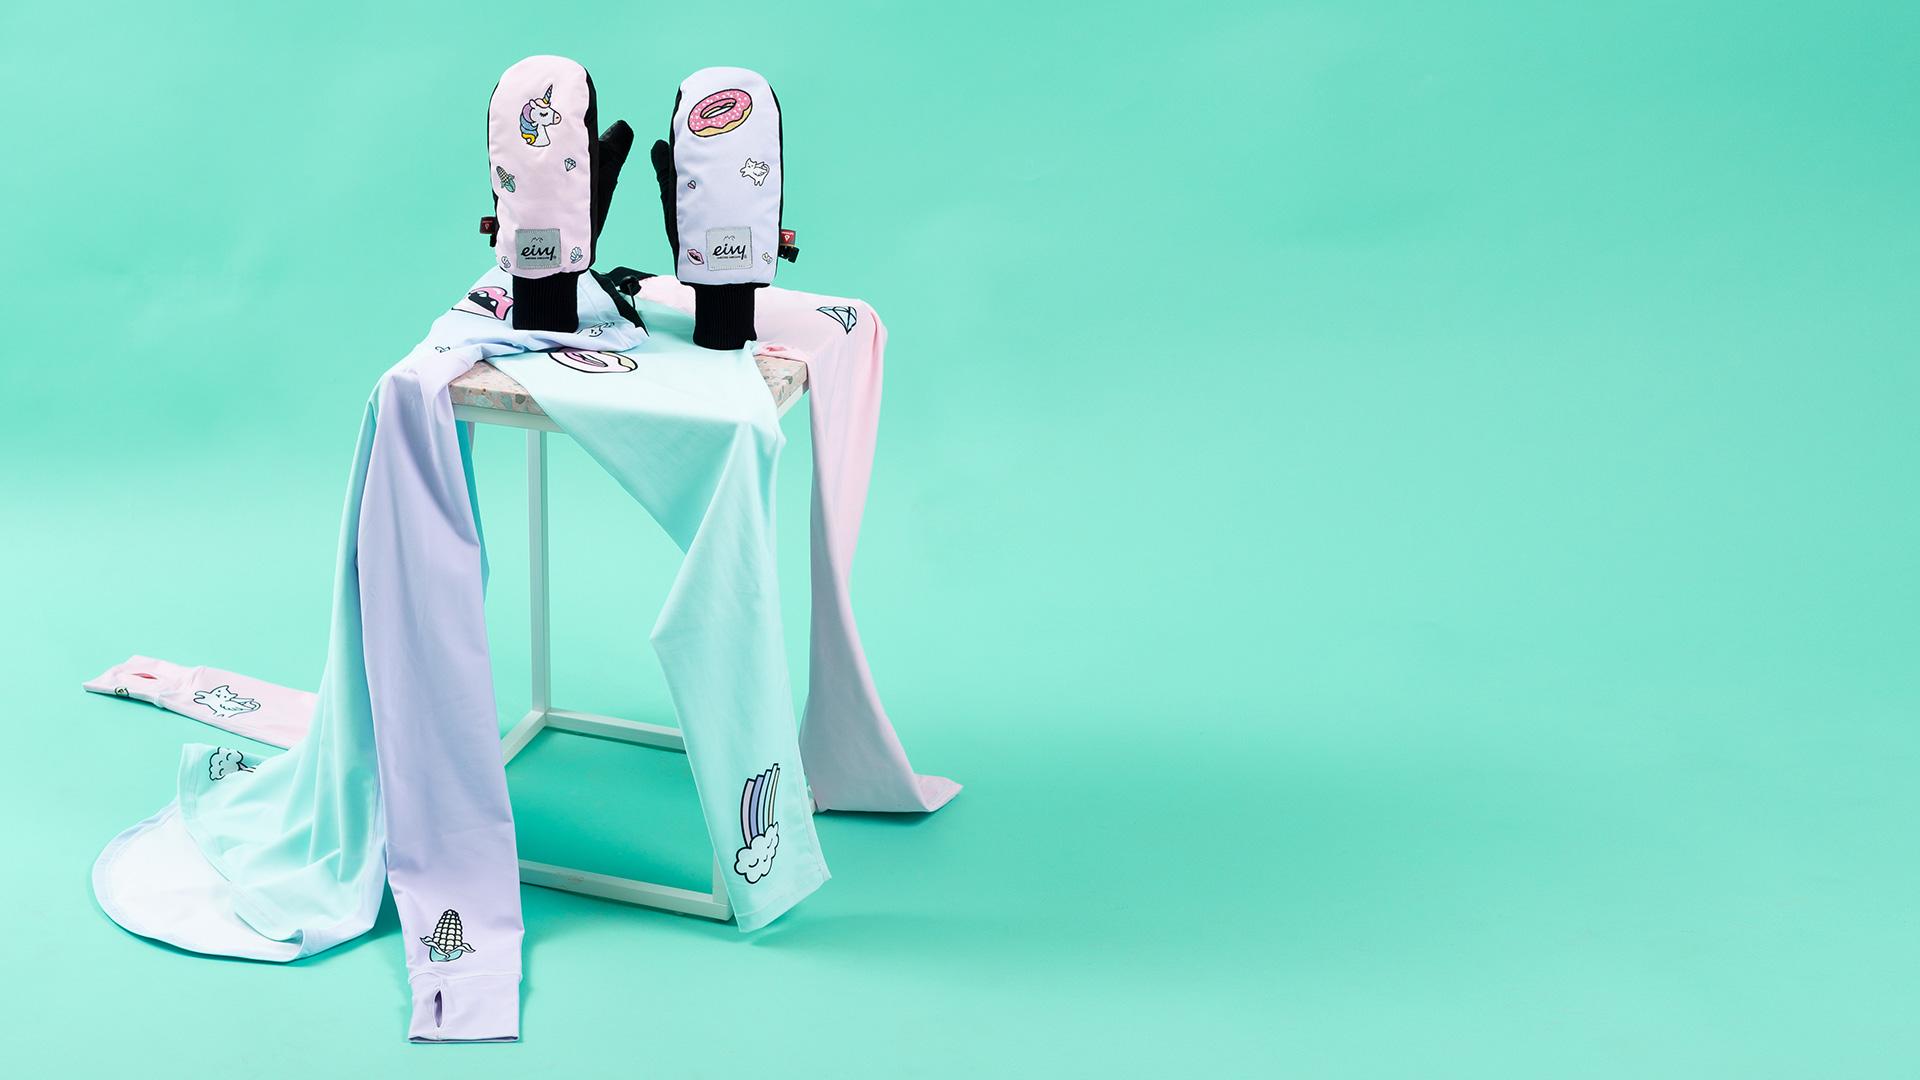 slider-image-https://www.eivyclothing.com/image/3739/Transform-x-Eivy-Mittens-Shopbyprint-Unicorny.jpg